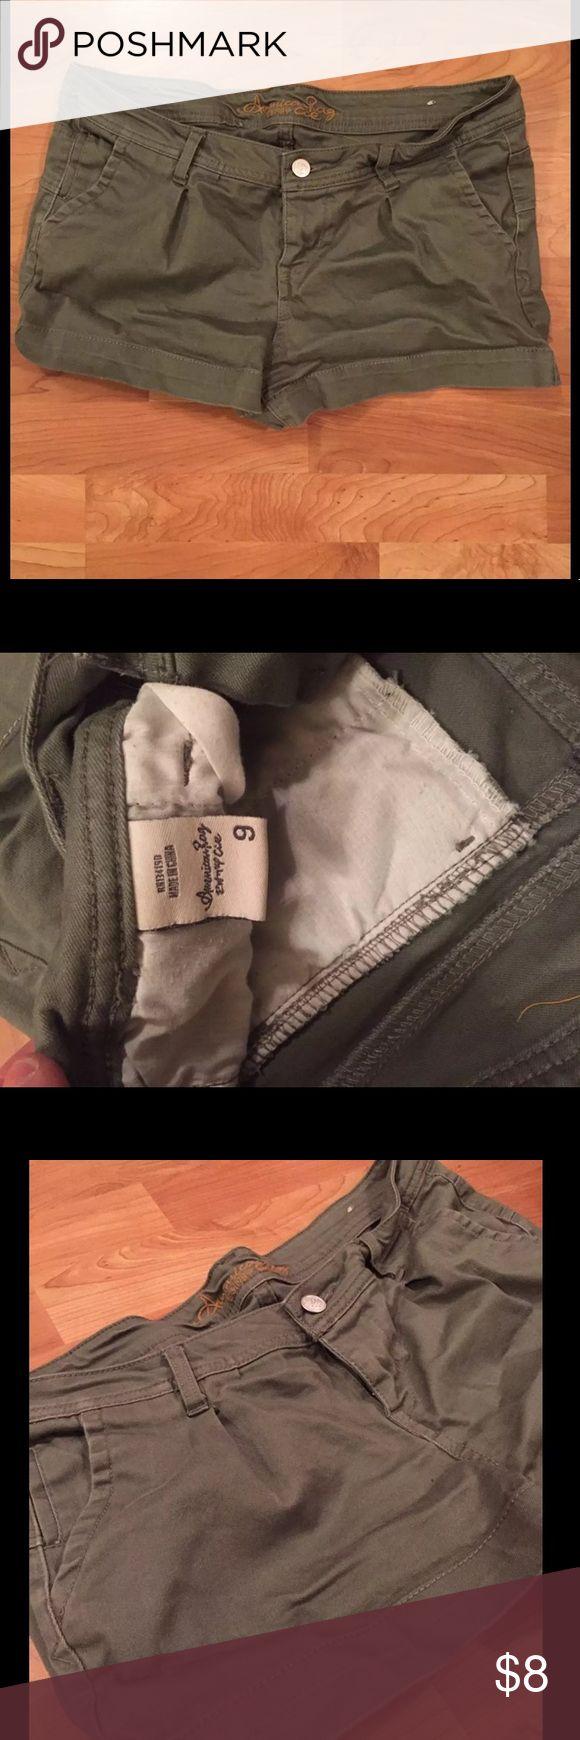 American Rag Army Green Shorts American Rag Army Green Shorts Purchased from Macy's  Size : 9 American Rag Shorts